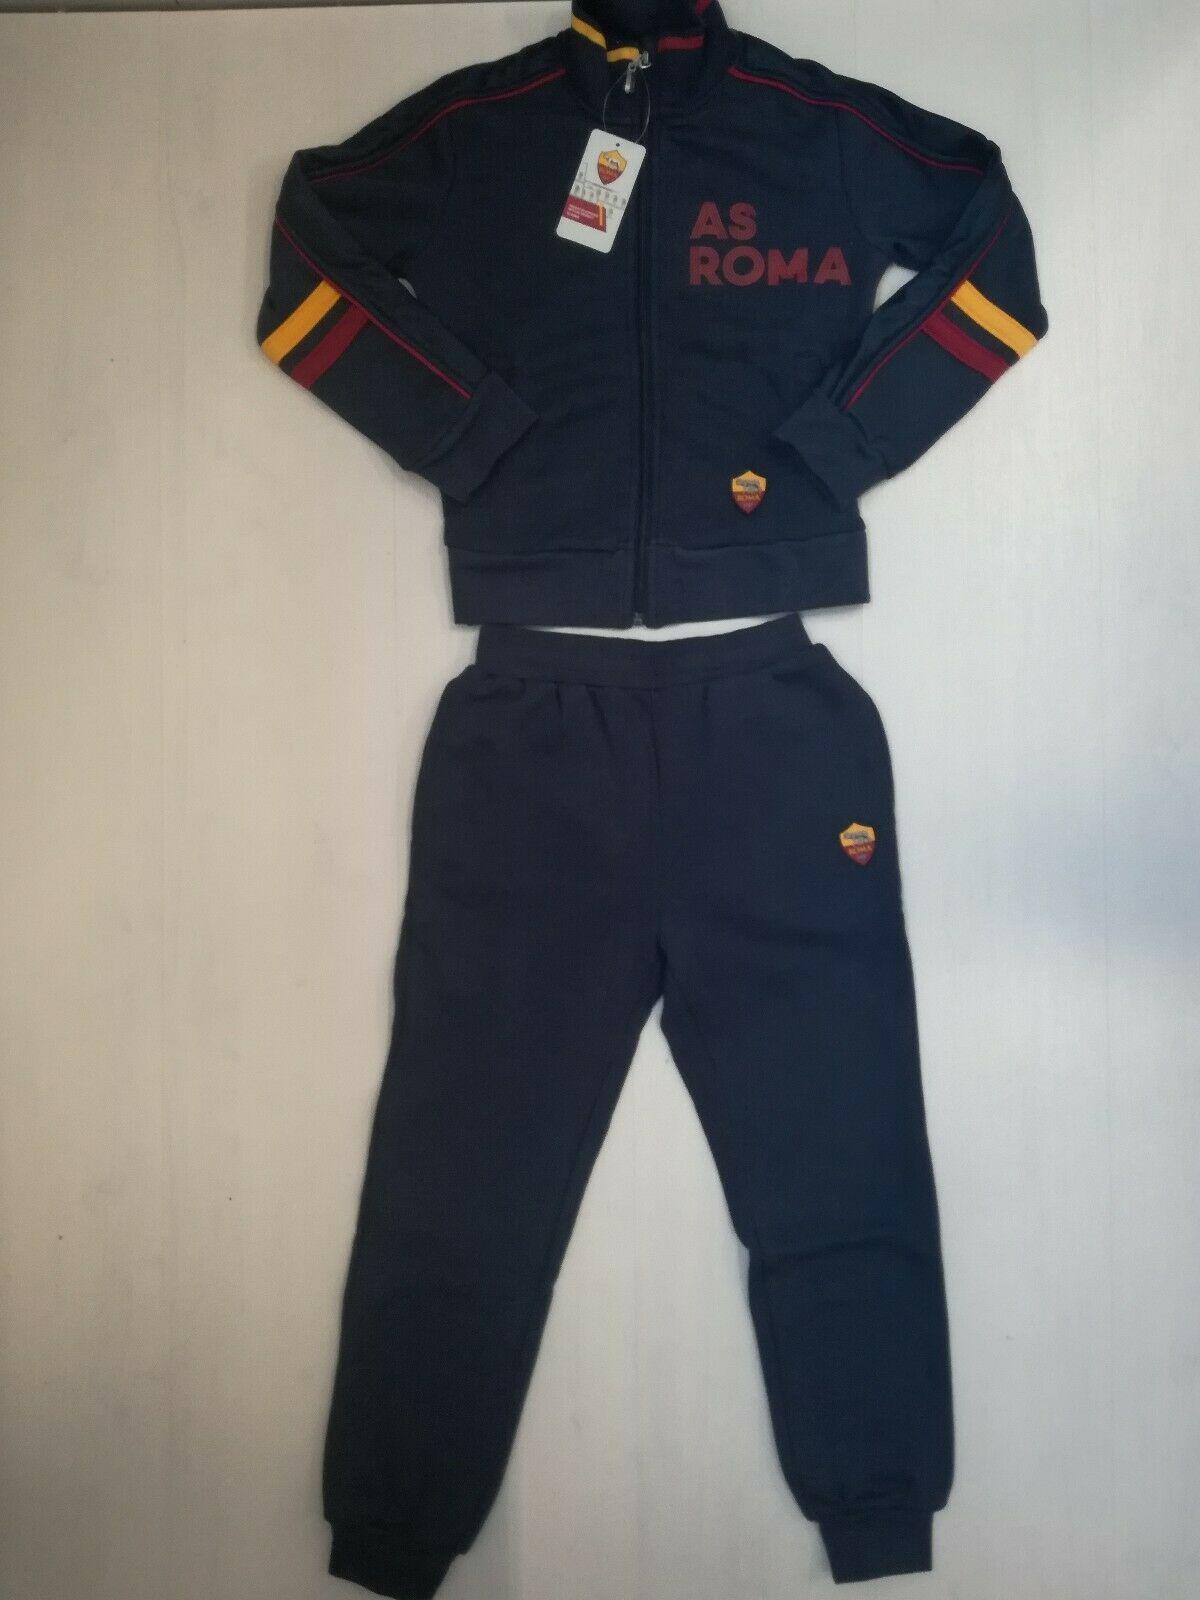 ROMA AMISTAD TUTA COTONE FELPATO SUIT FELPA PANTALONE BAMBINO JR A19B1 R13895